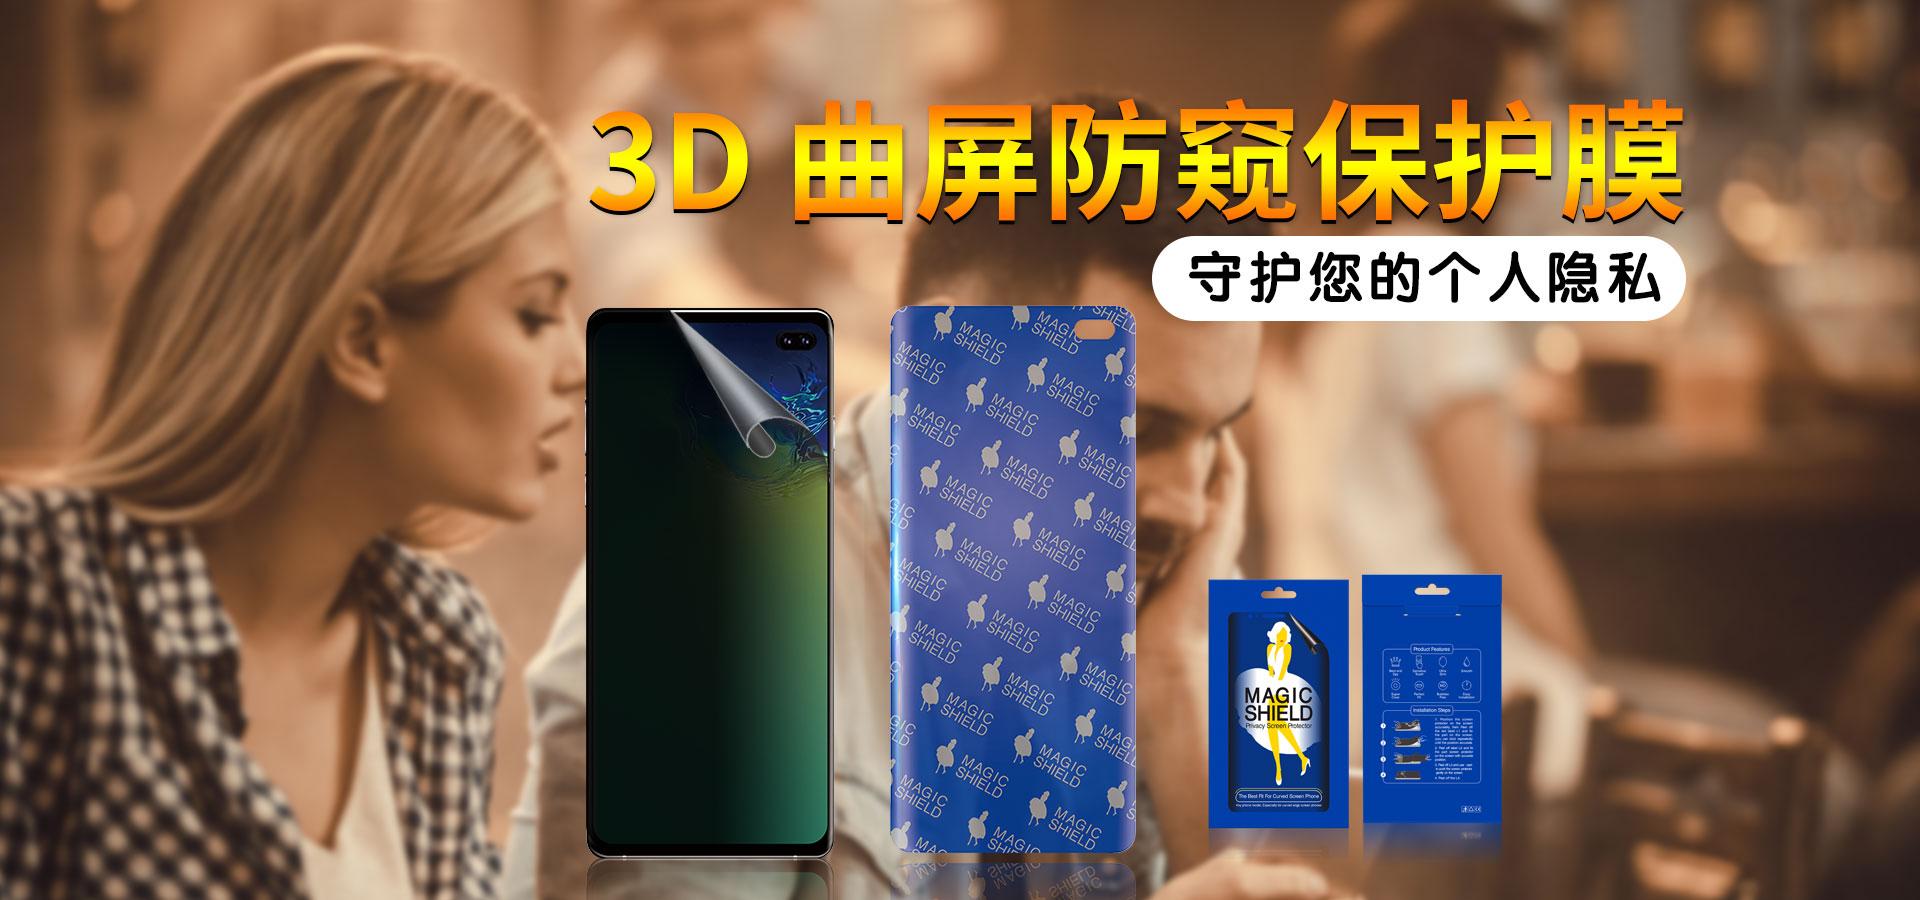 3D曲屏手机防窥保护膜